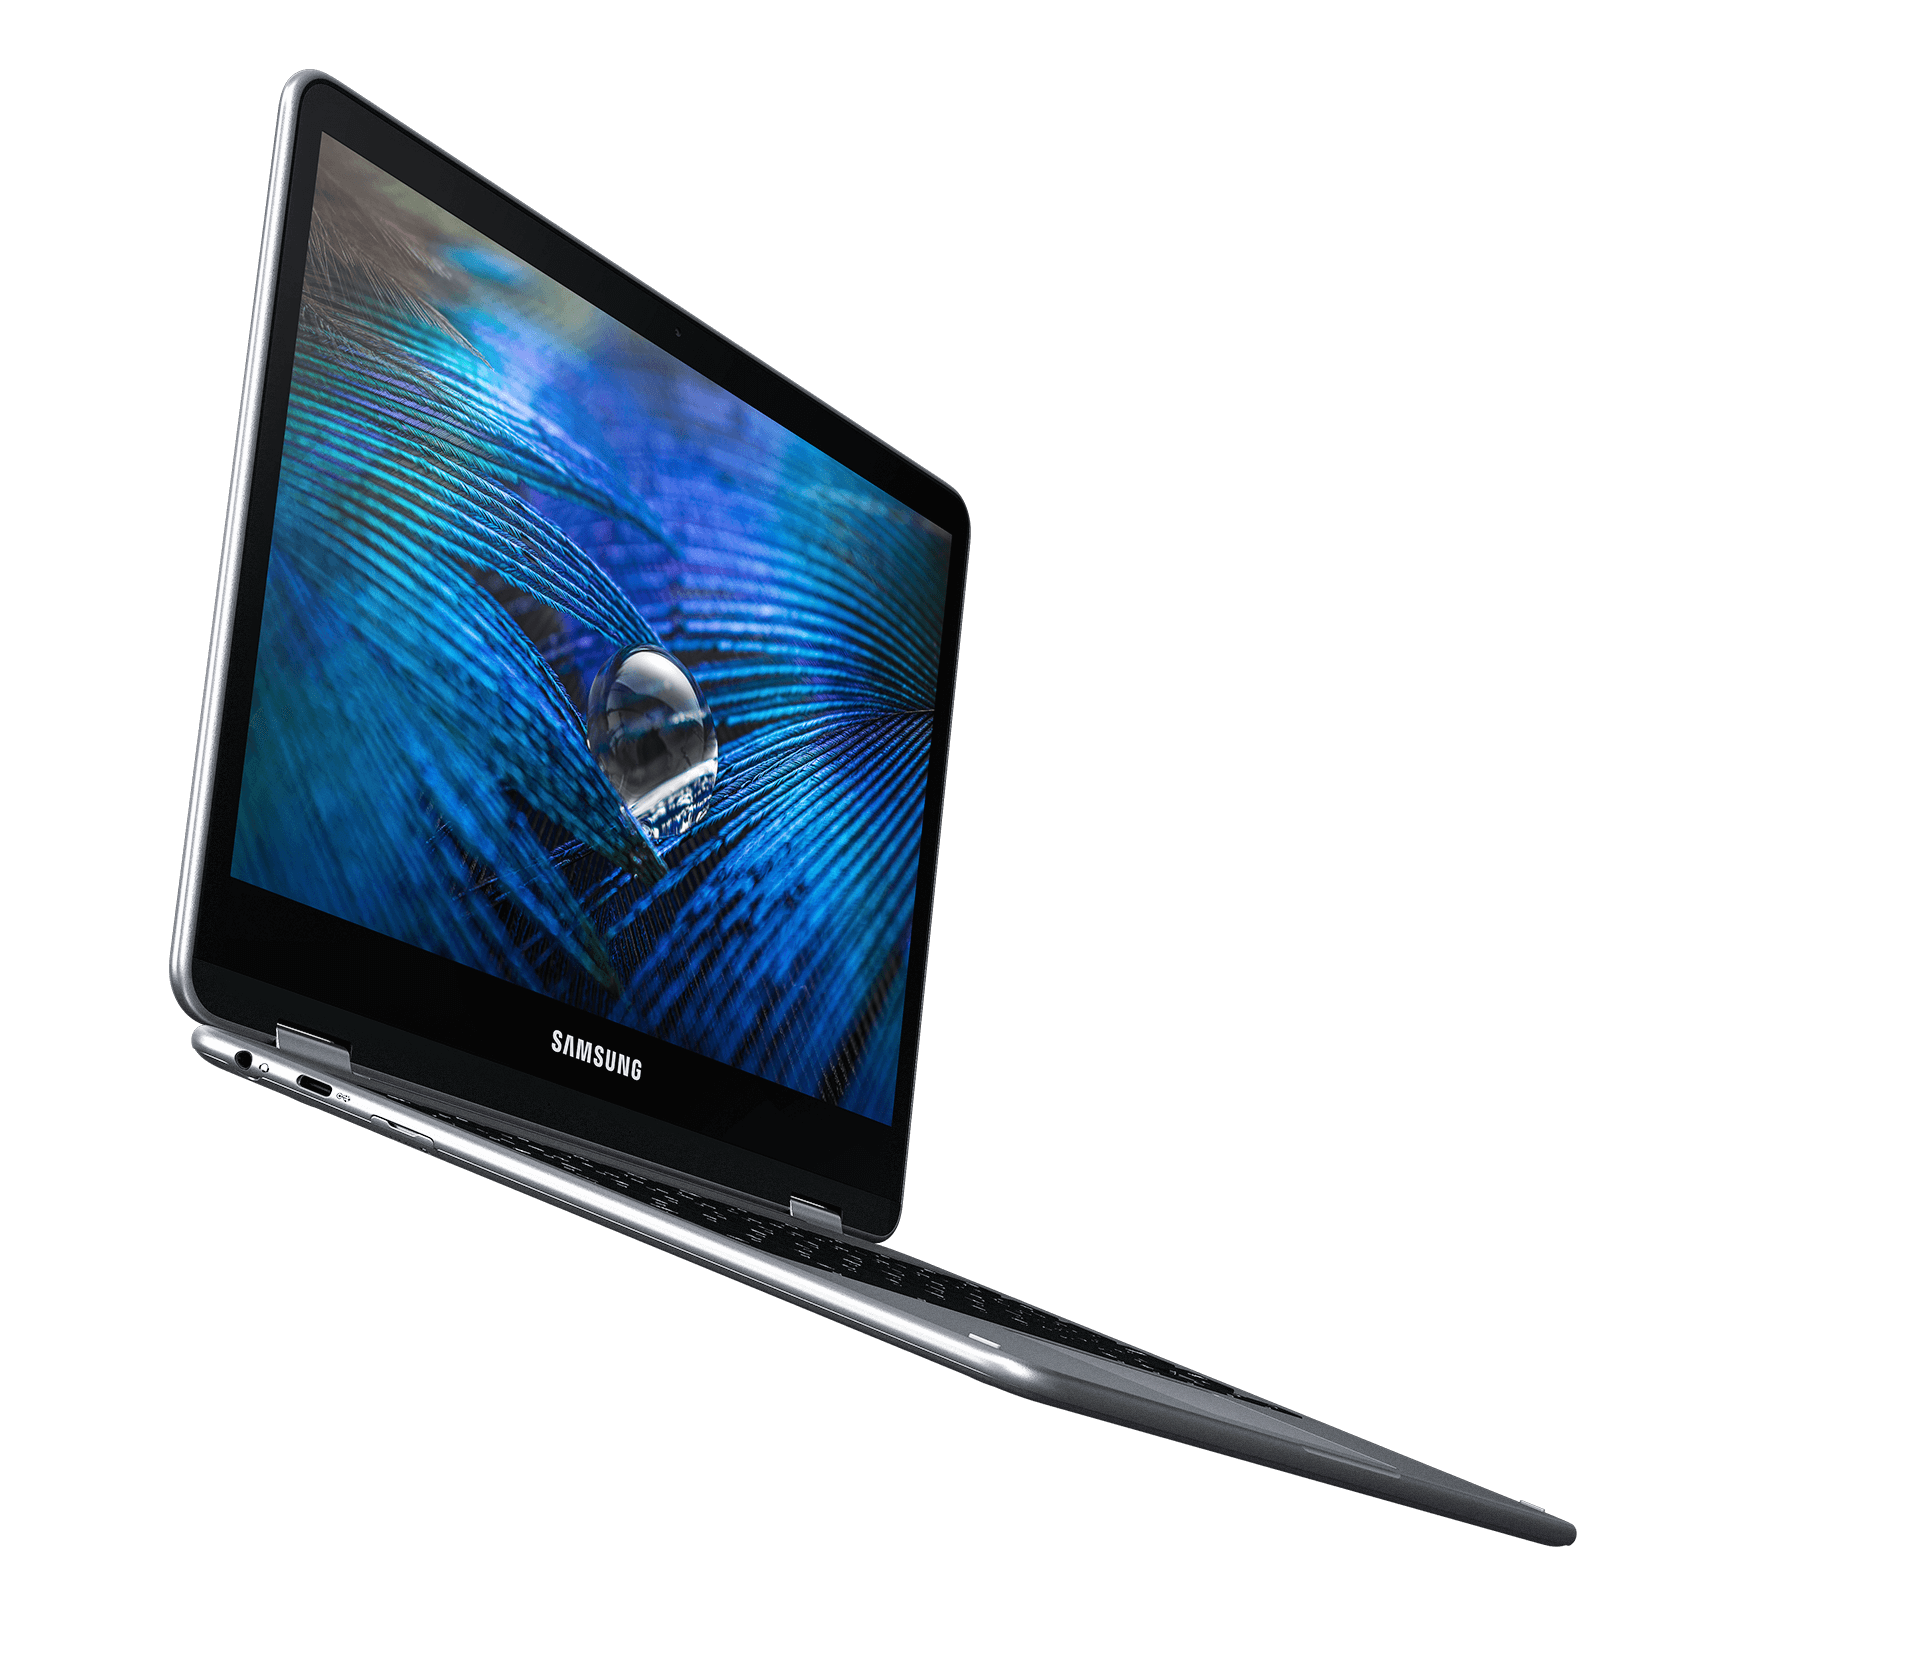 Novità in arrivo — Samsung Chromebook Pro